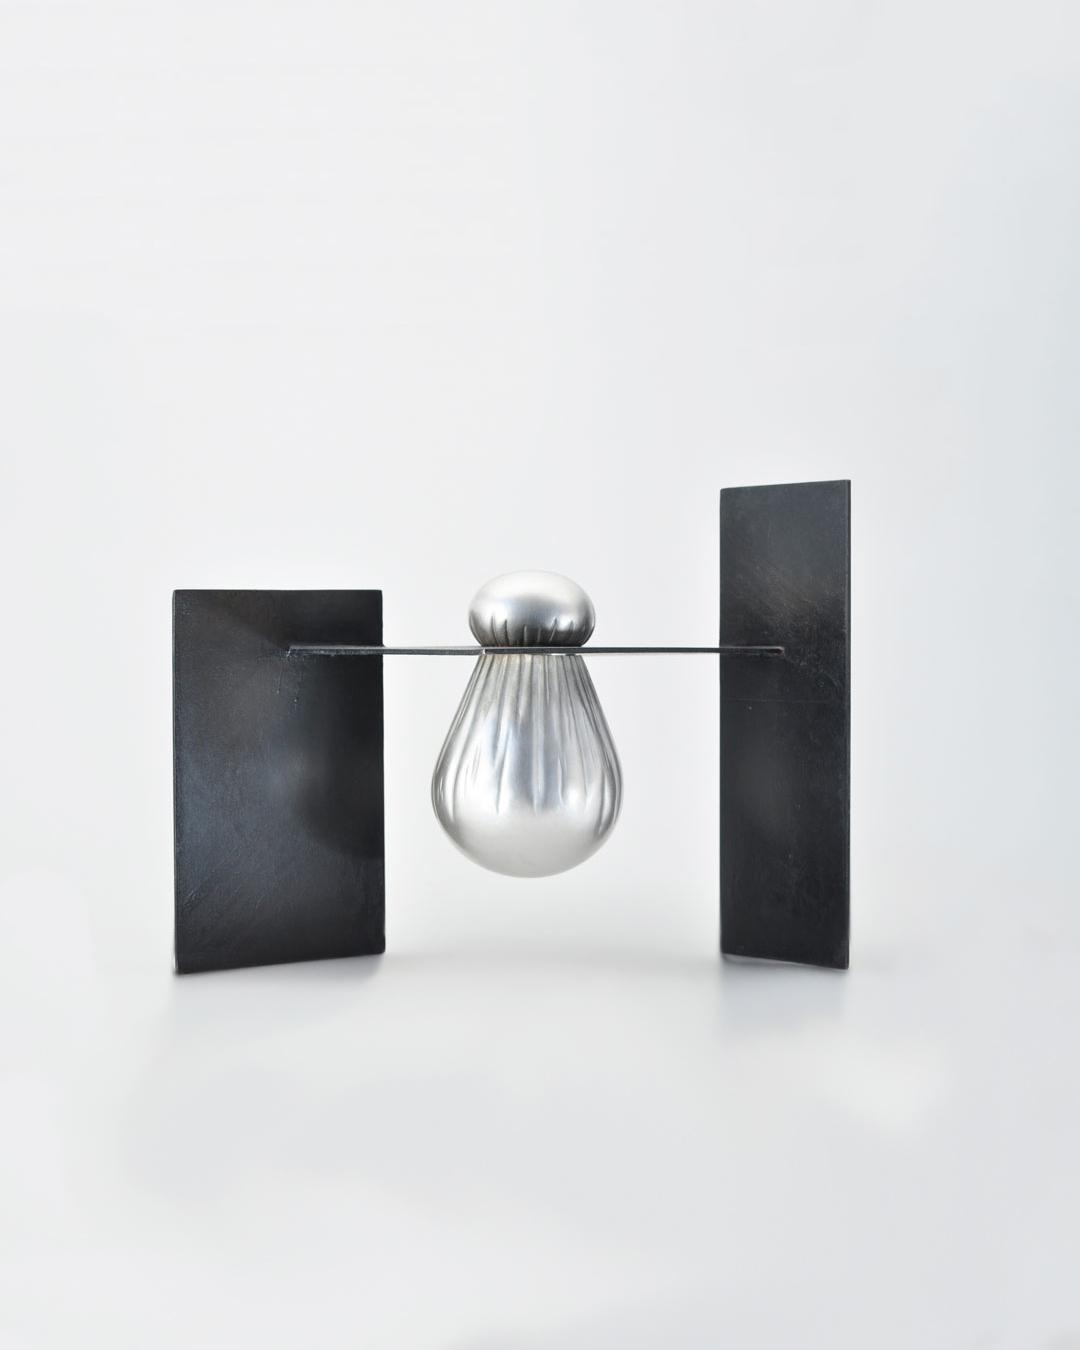 Anders Ljungberg, Bag Beneath, 2019, object; silver, steel, 325 x 260 x 270 mm, €7020